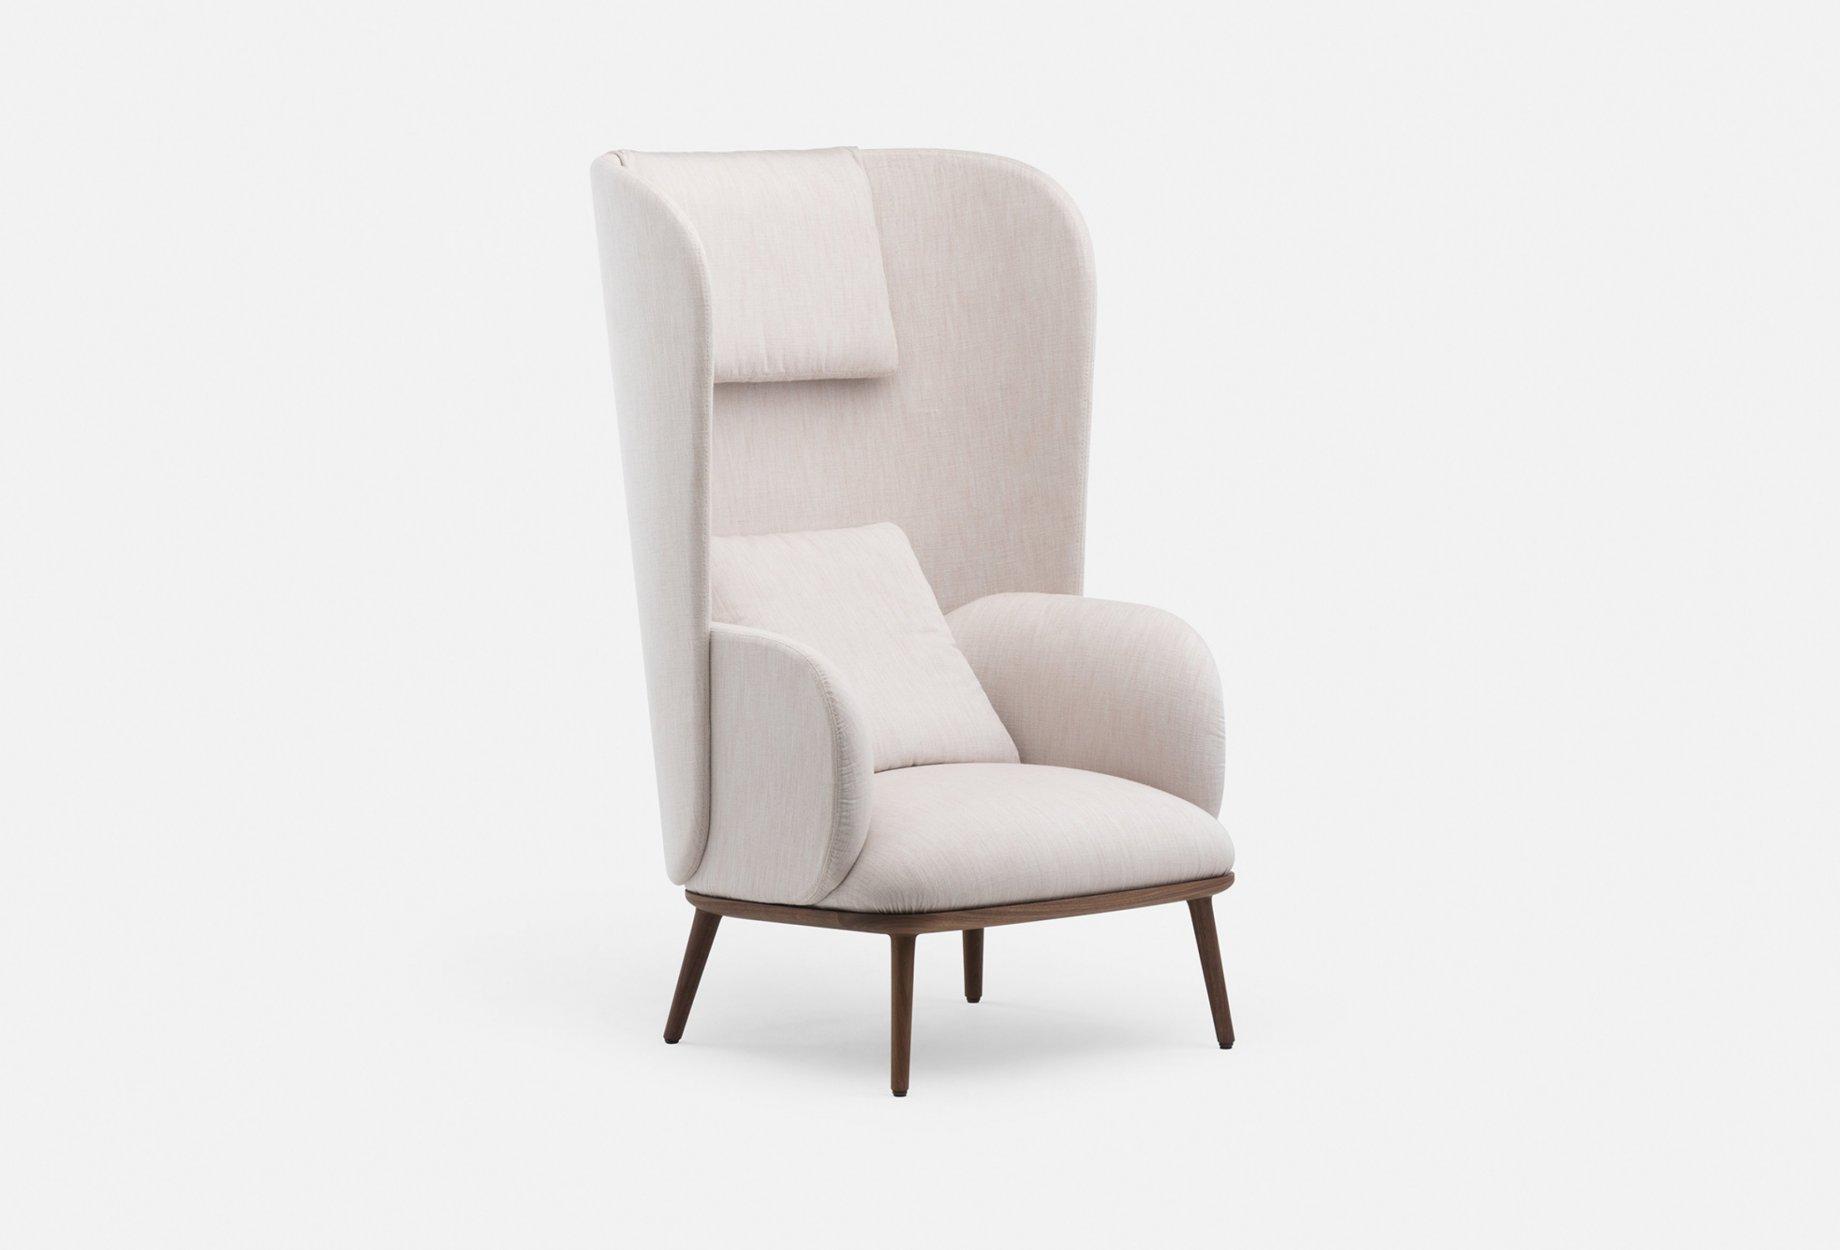 hotel ultra online shop nichetto sessel blanche. Black Bedroom Furniture Sets. Home Design Ideas